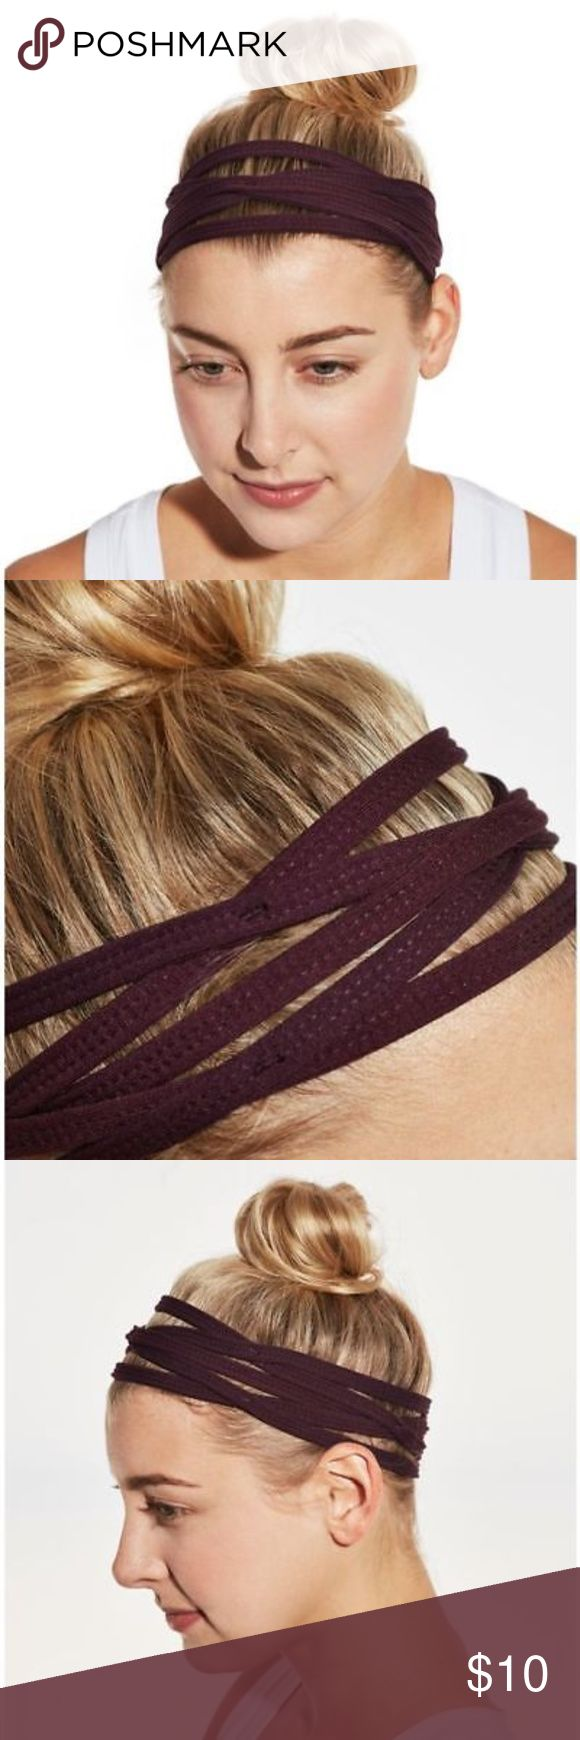 best 25+ 5 strand headband ideas on pinterest | braided bracelets